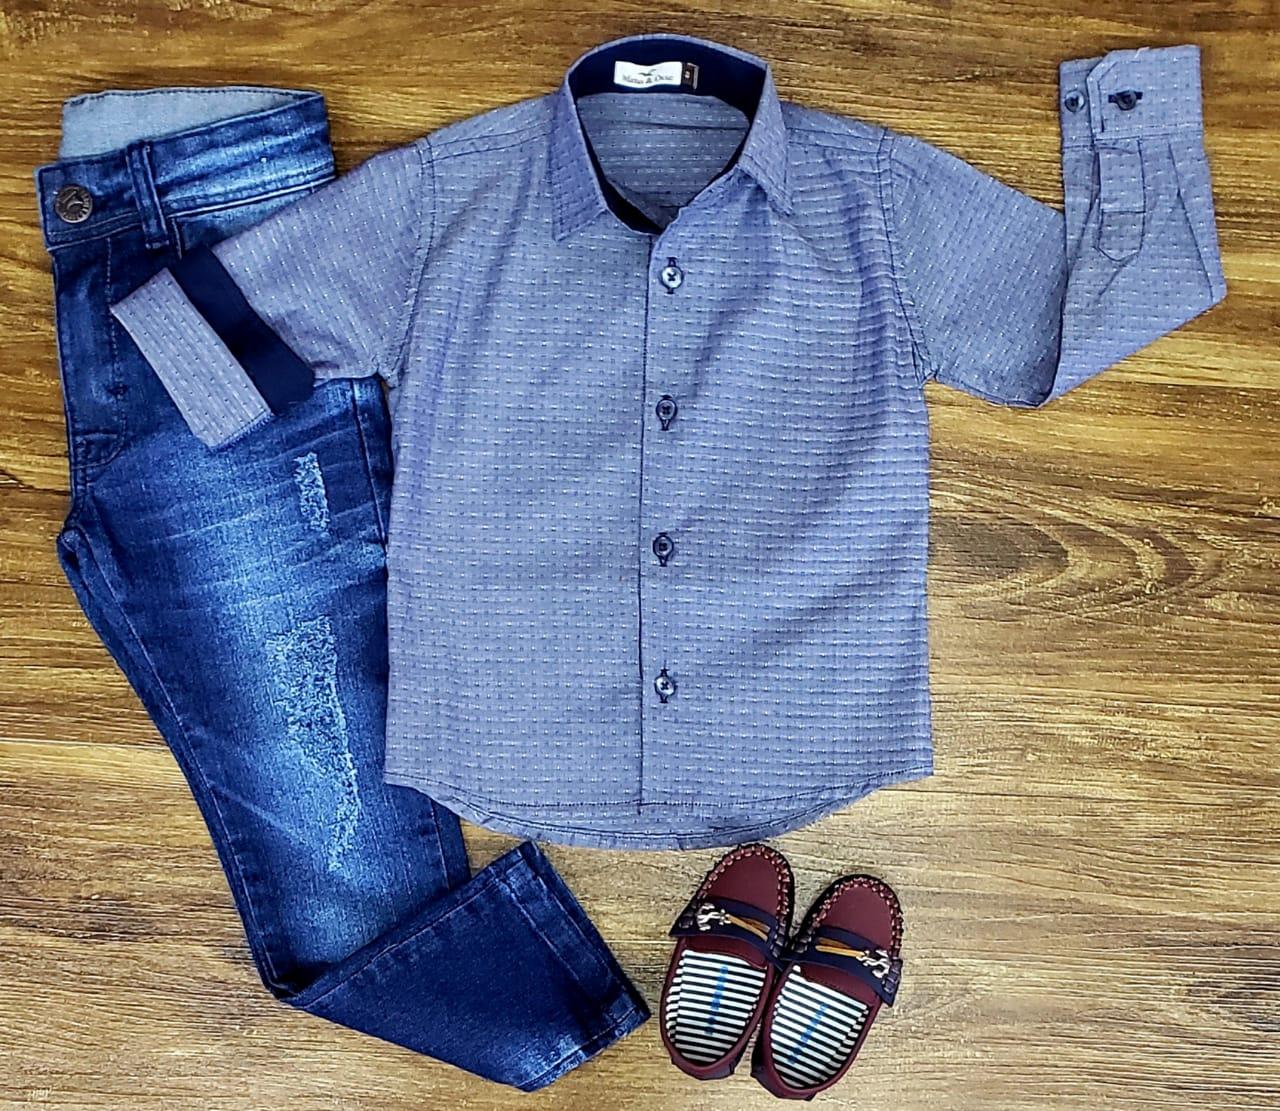 Calça Jeans com Camisa Manga Longa